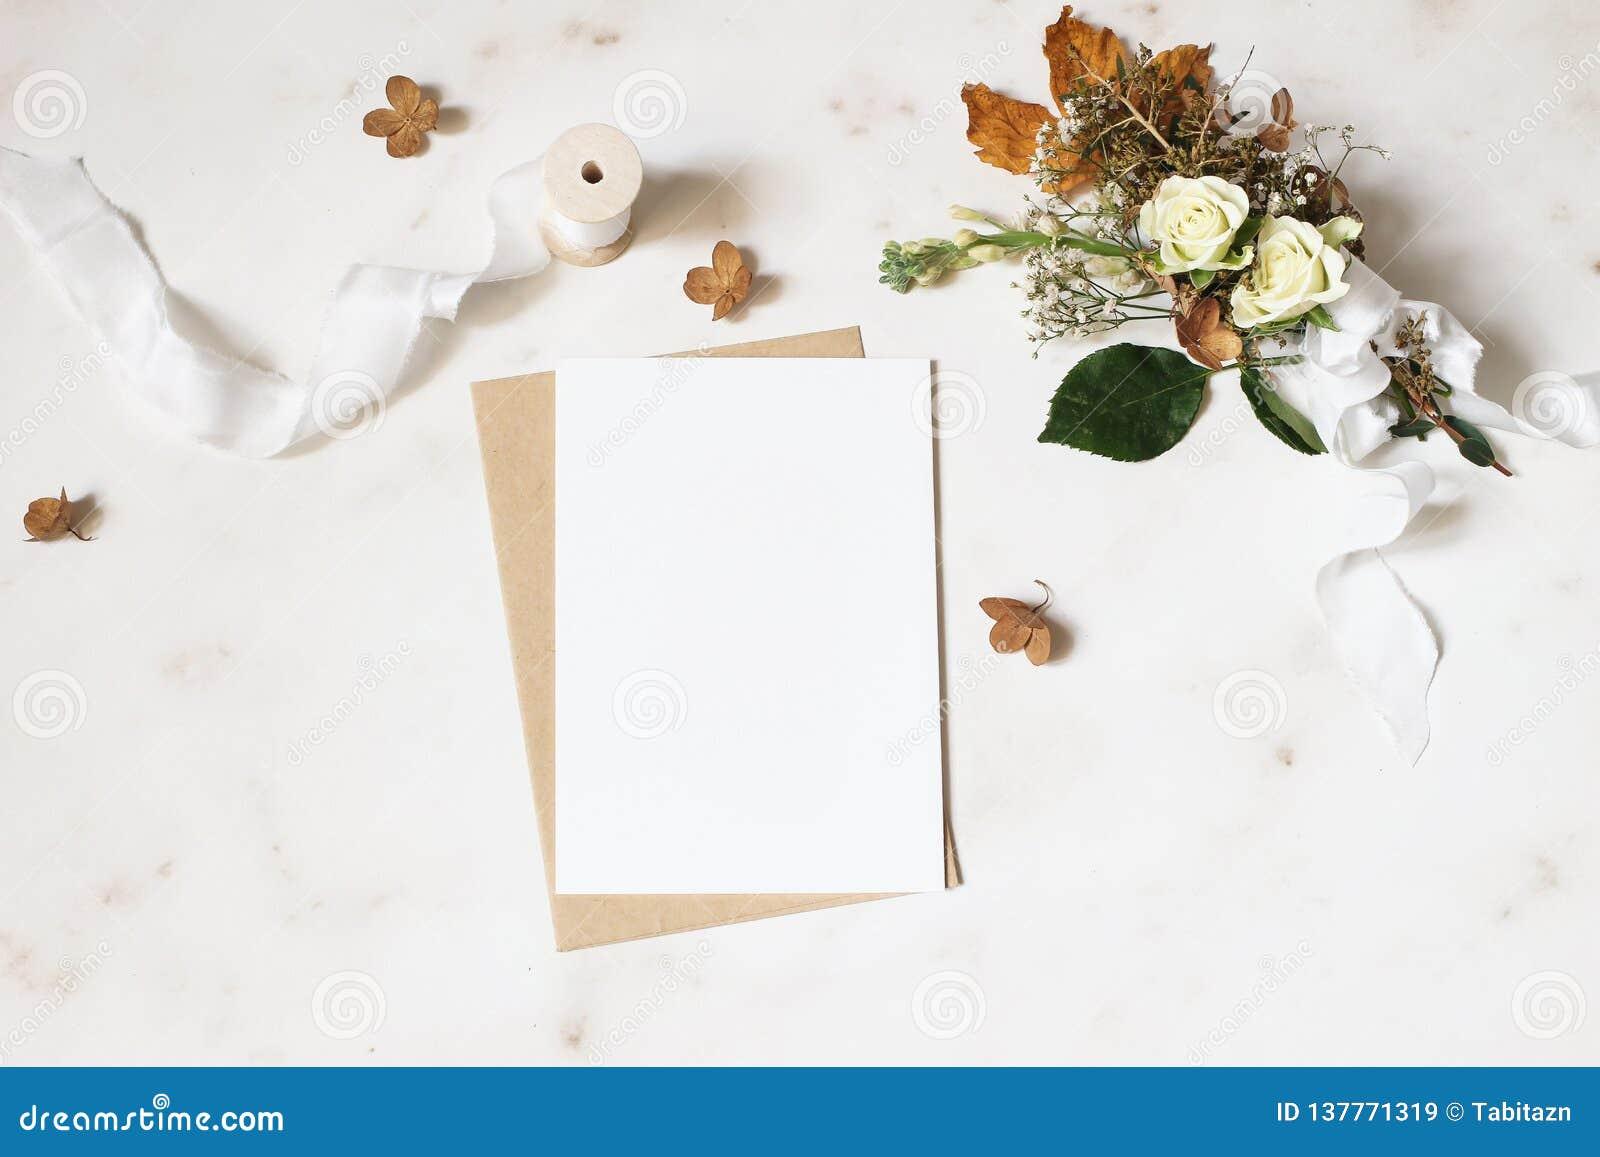 Feminine winter wedding, birthday stationery mock-up scene. Blank greeting card, envelope. Dry hydrangea, white roses